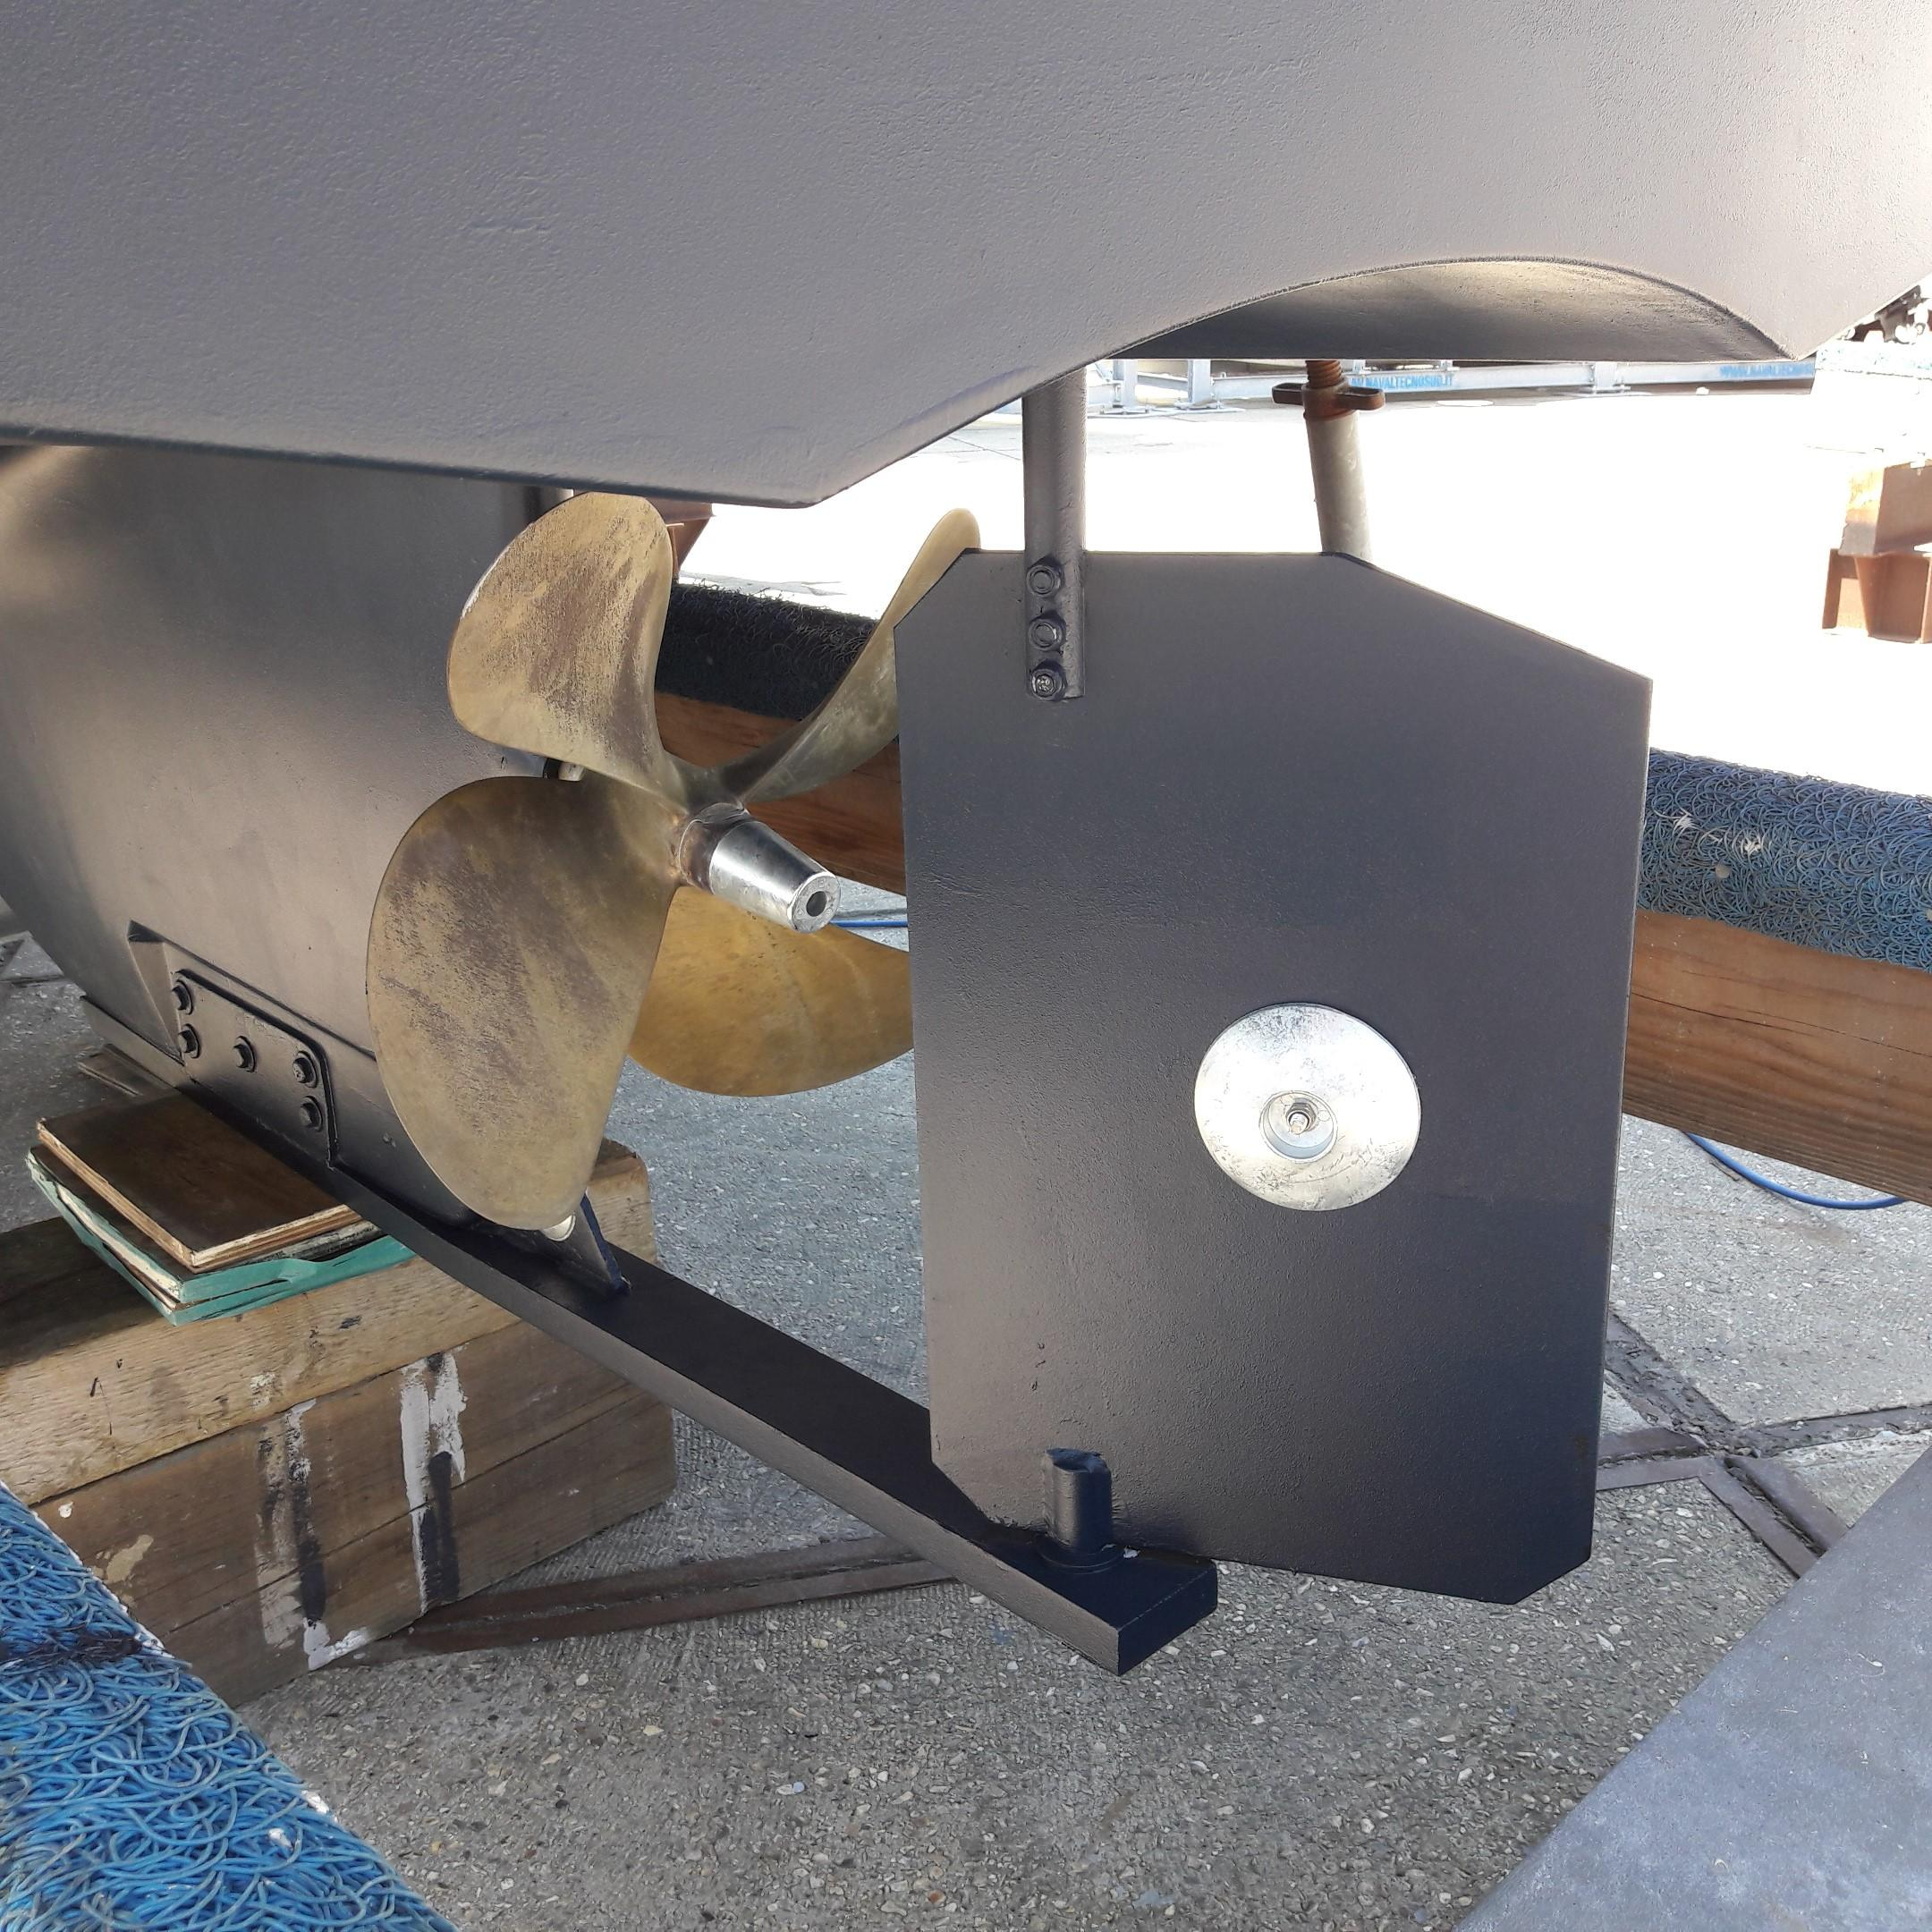 Rhea 730 Timonier - rudder & prop